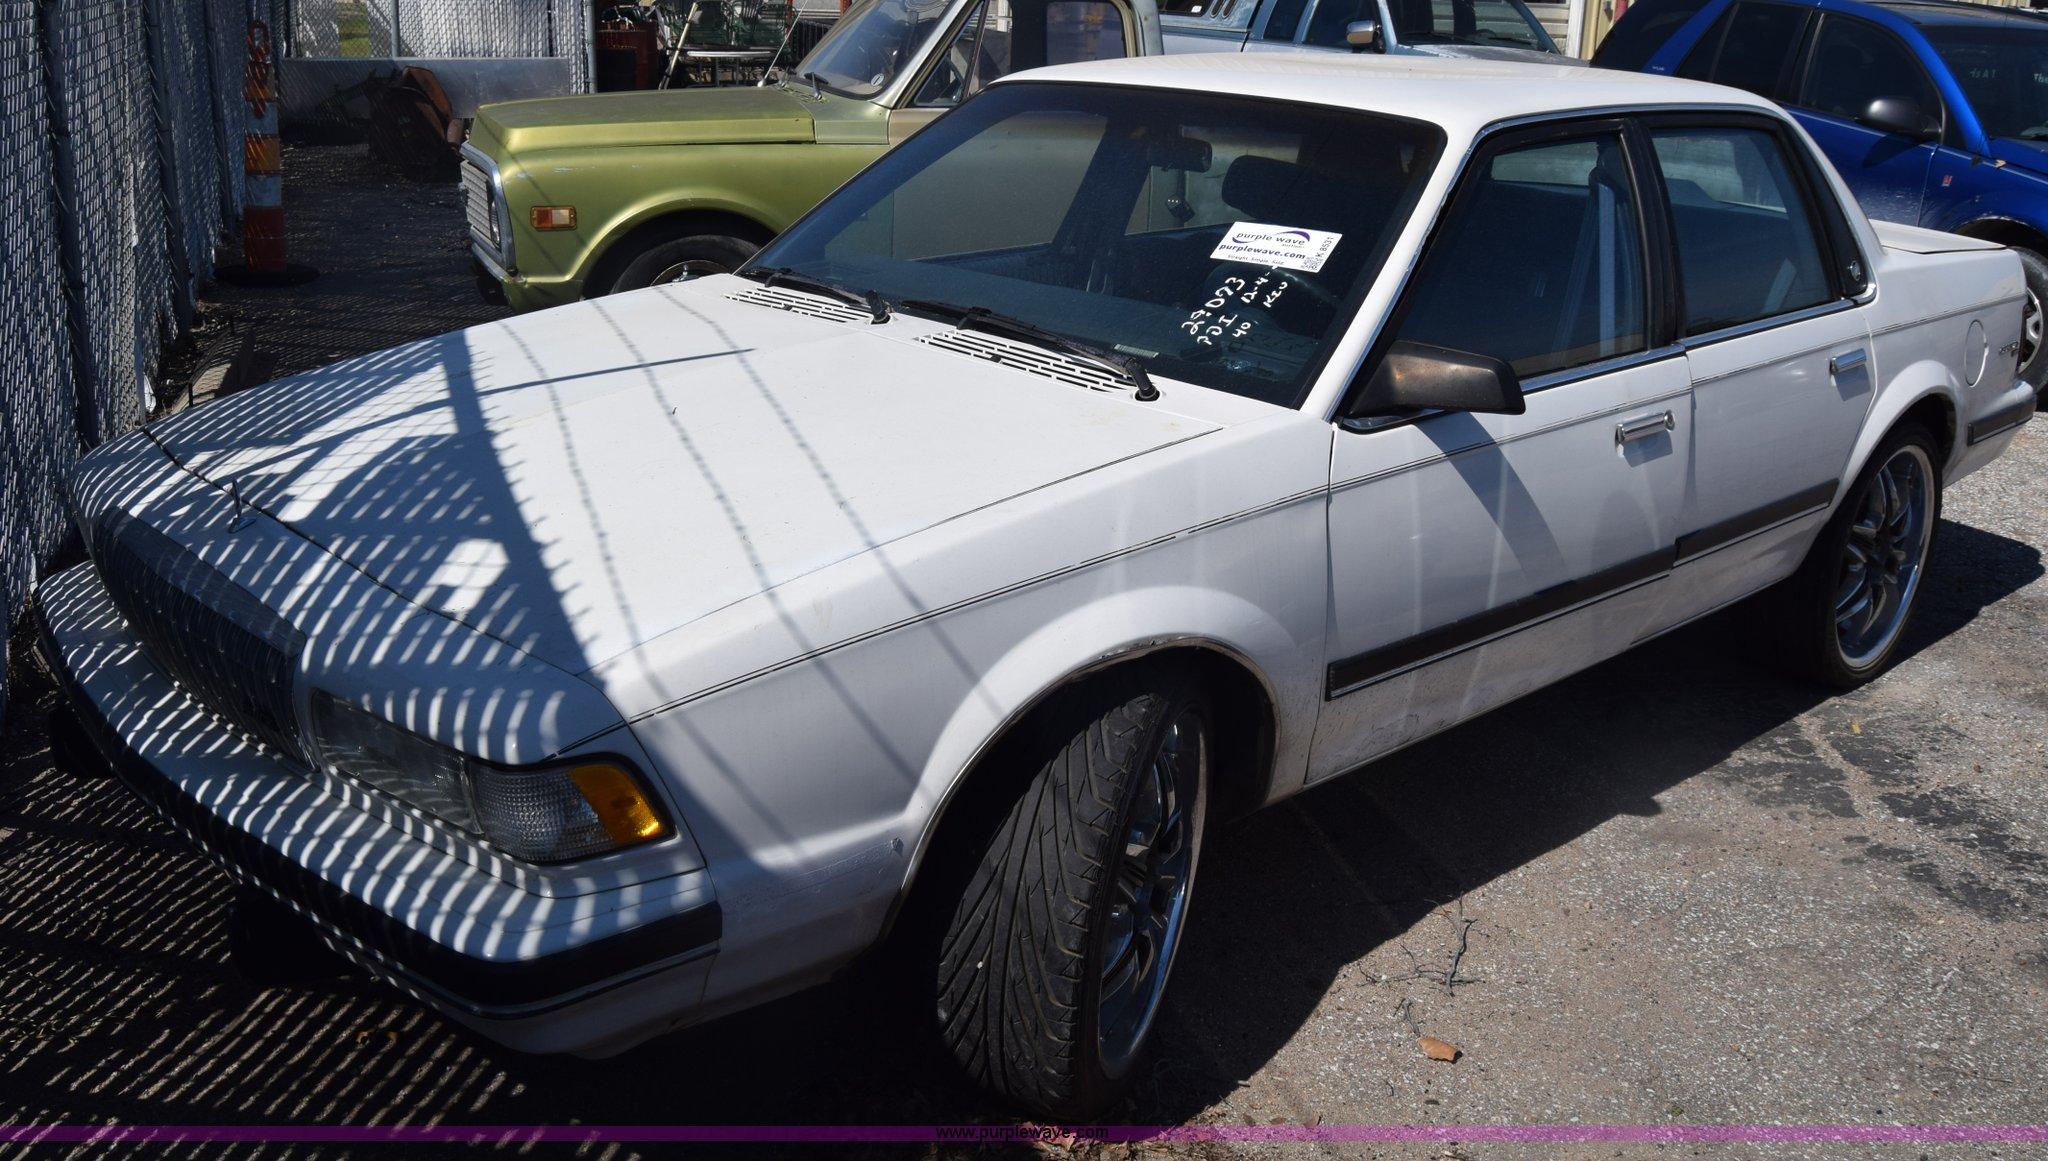 K8531 image for item k8531 1991 buick century custom